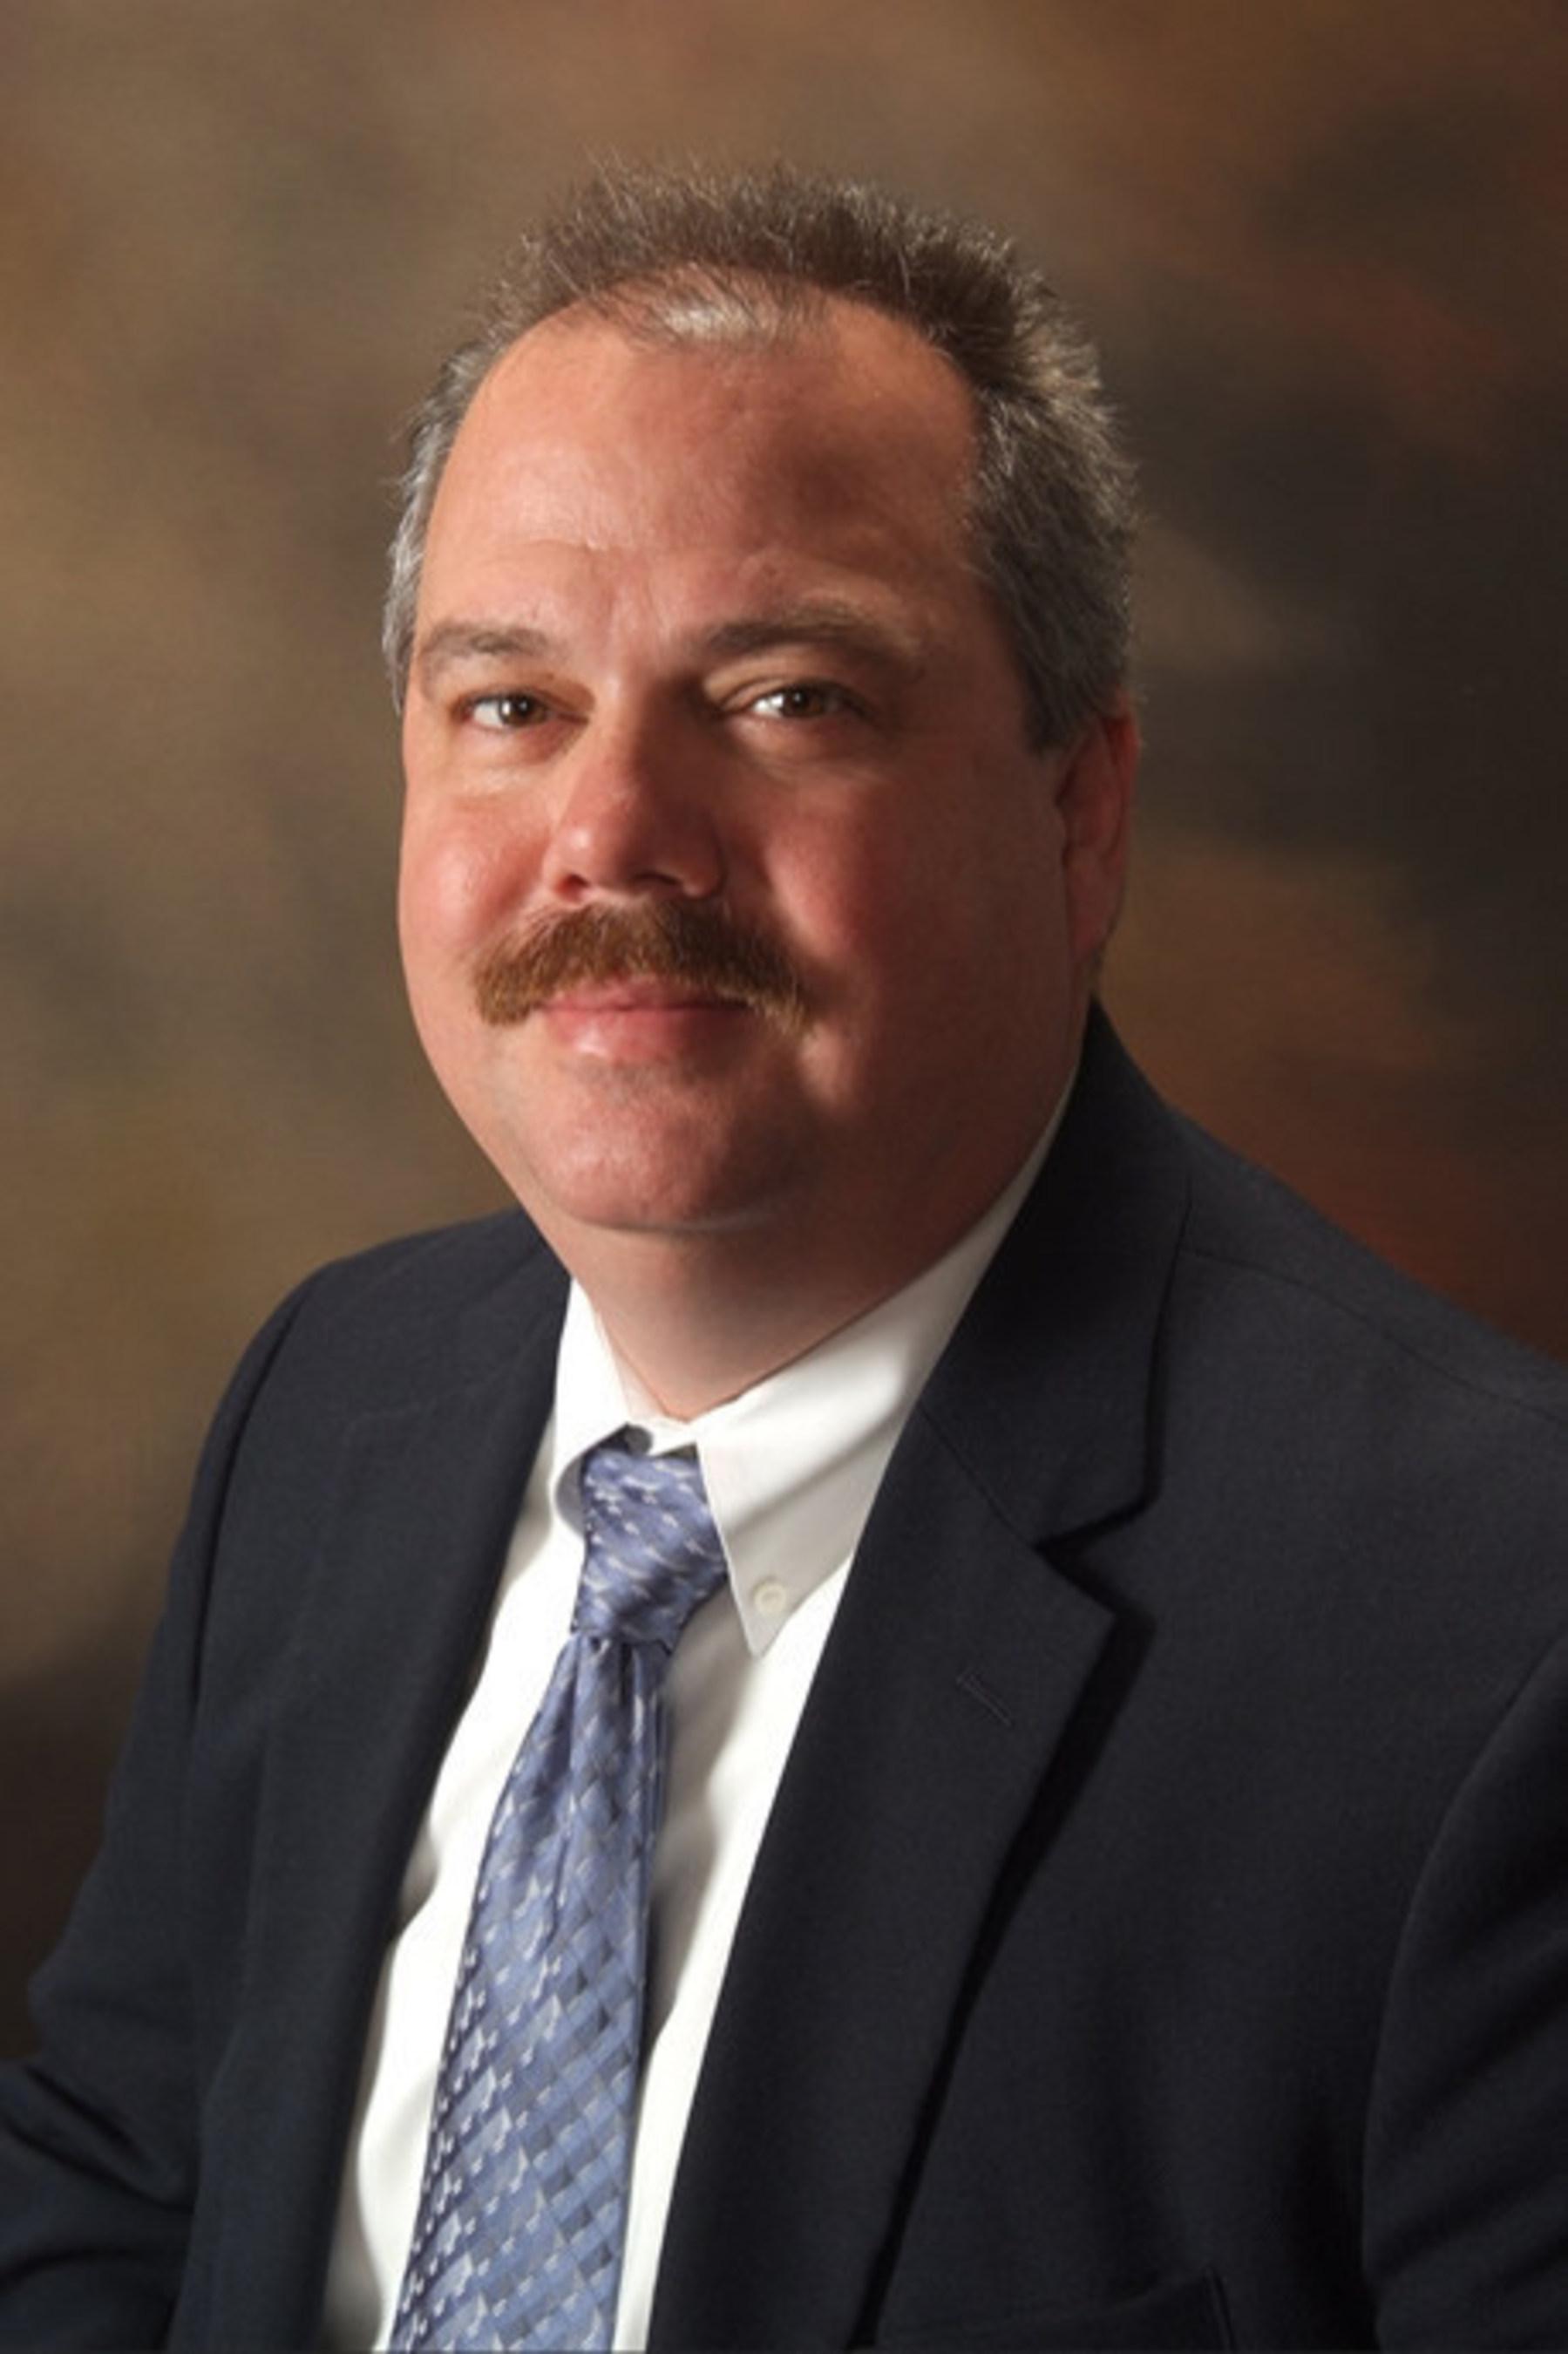 Kenneth Armstrong, RPM International Inc.